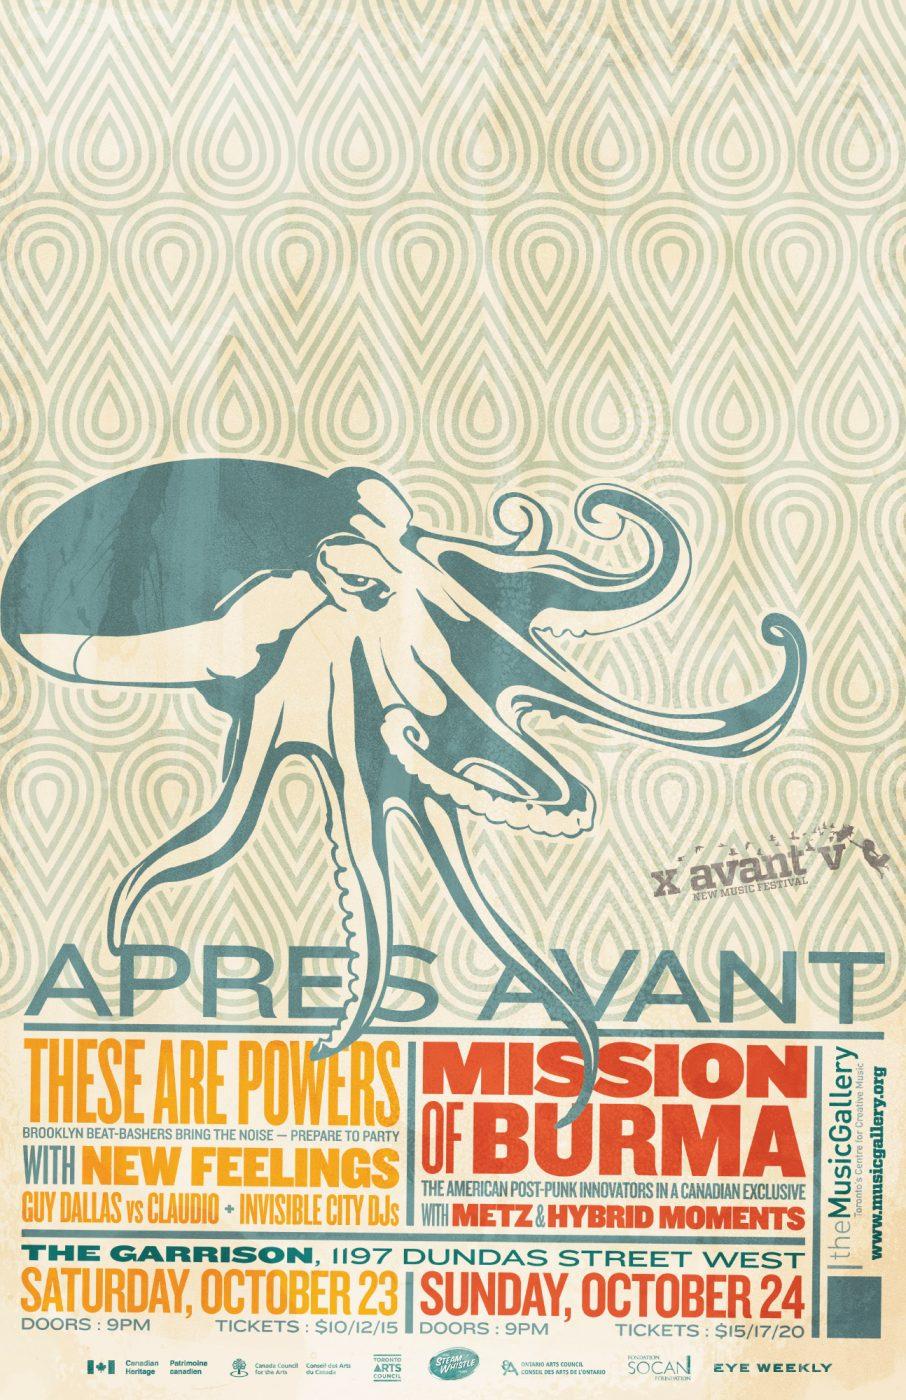 x-avant-main-posters-5